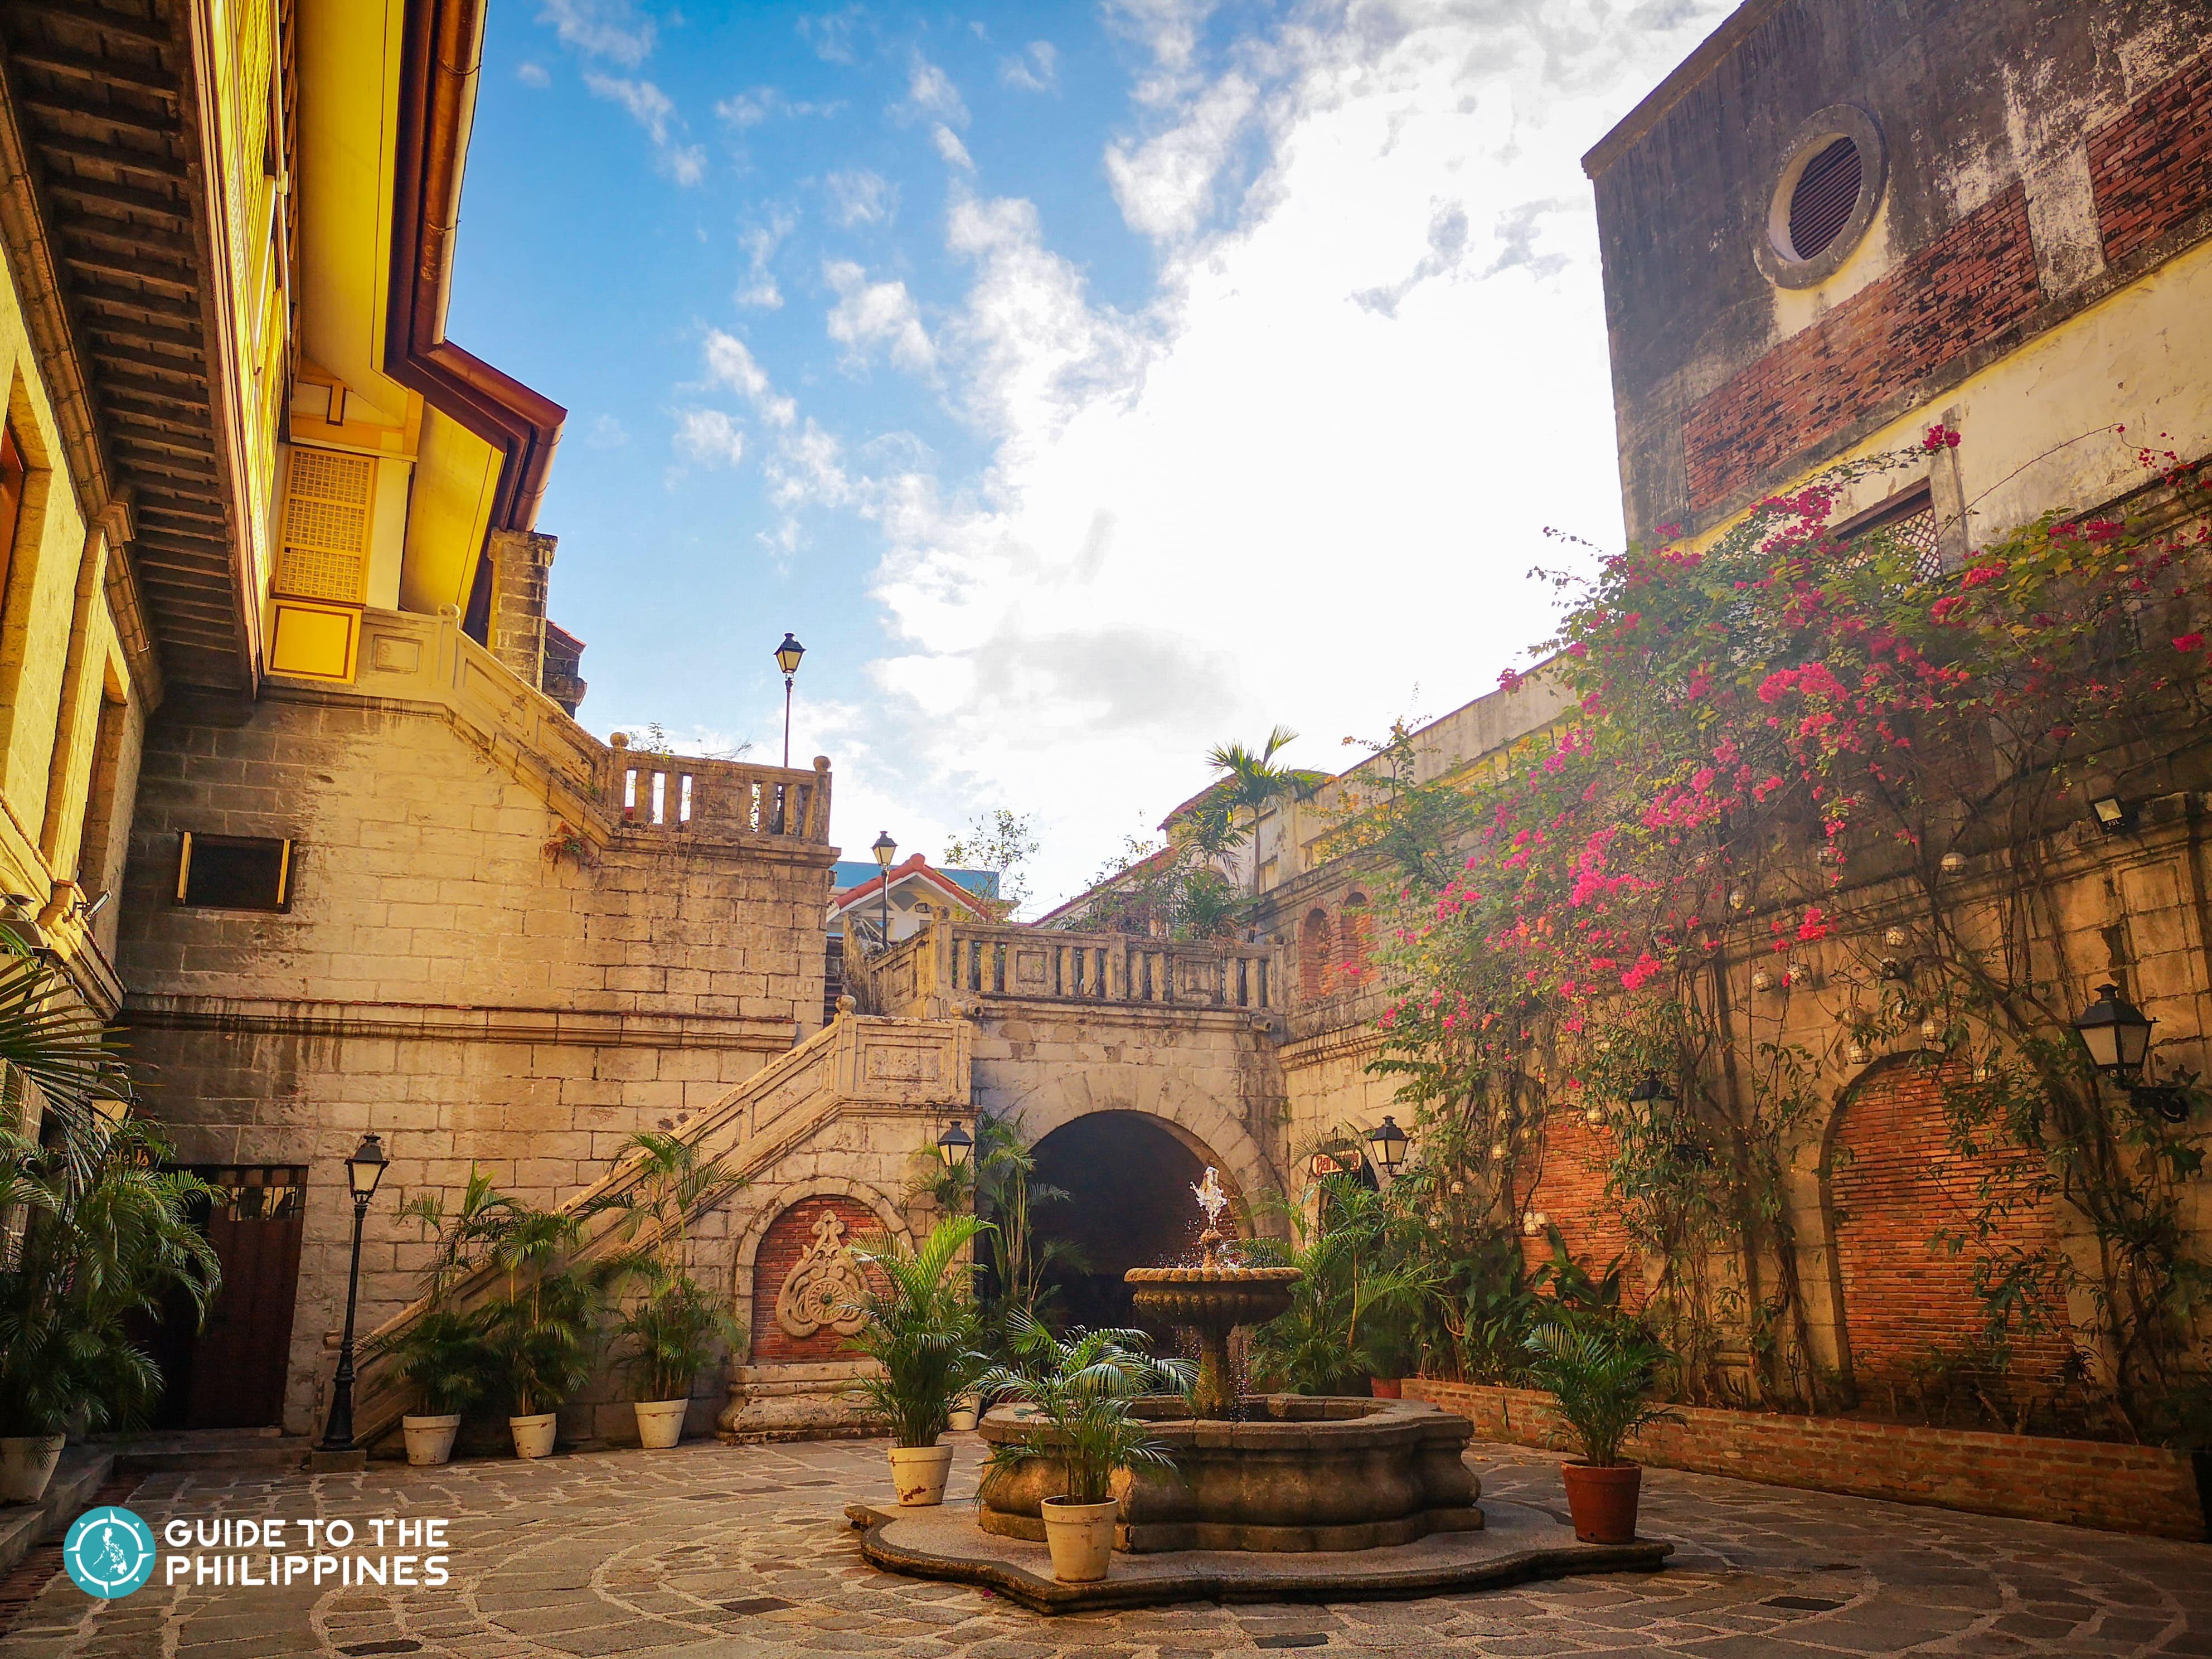 Courtyard at Casa Manila inside Intramuros